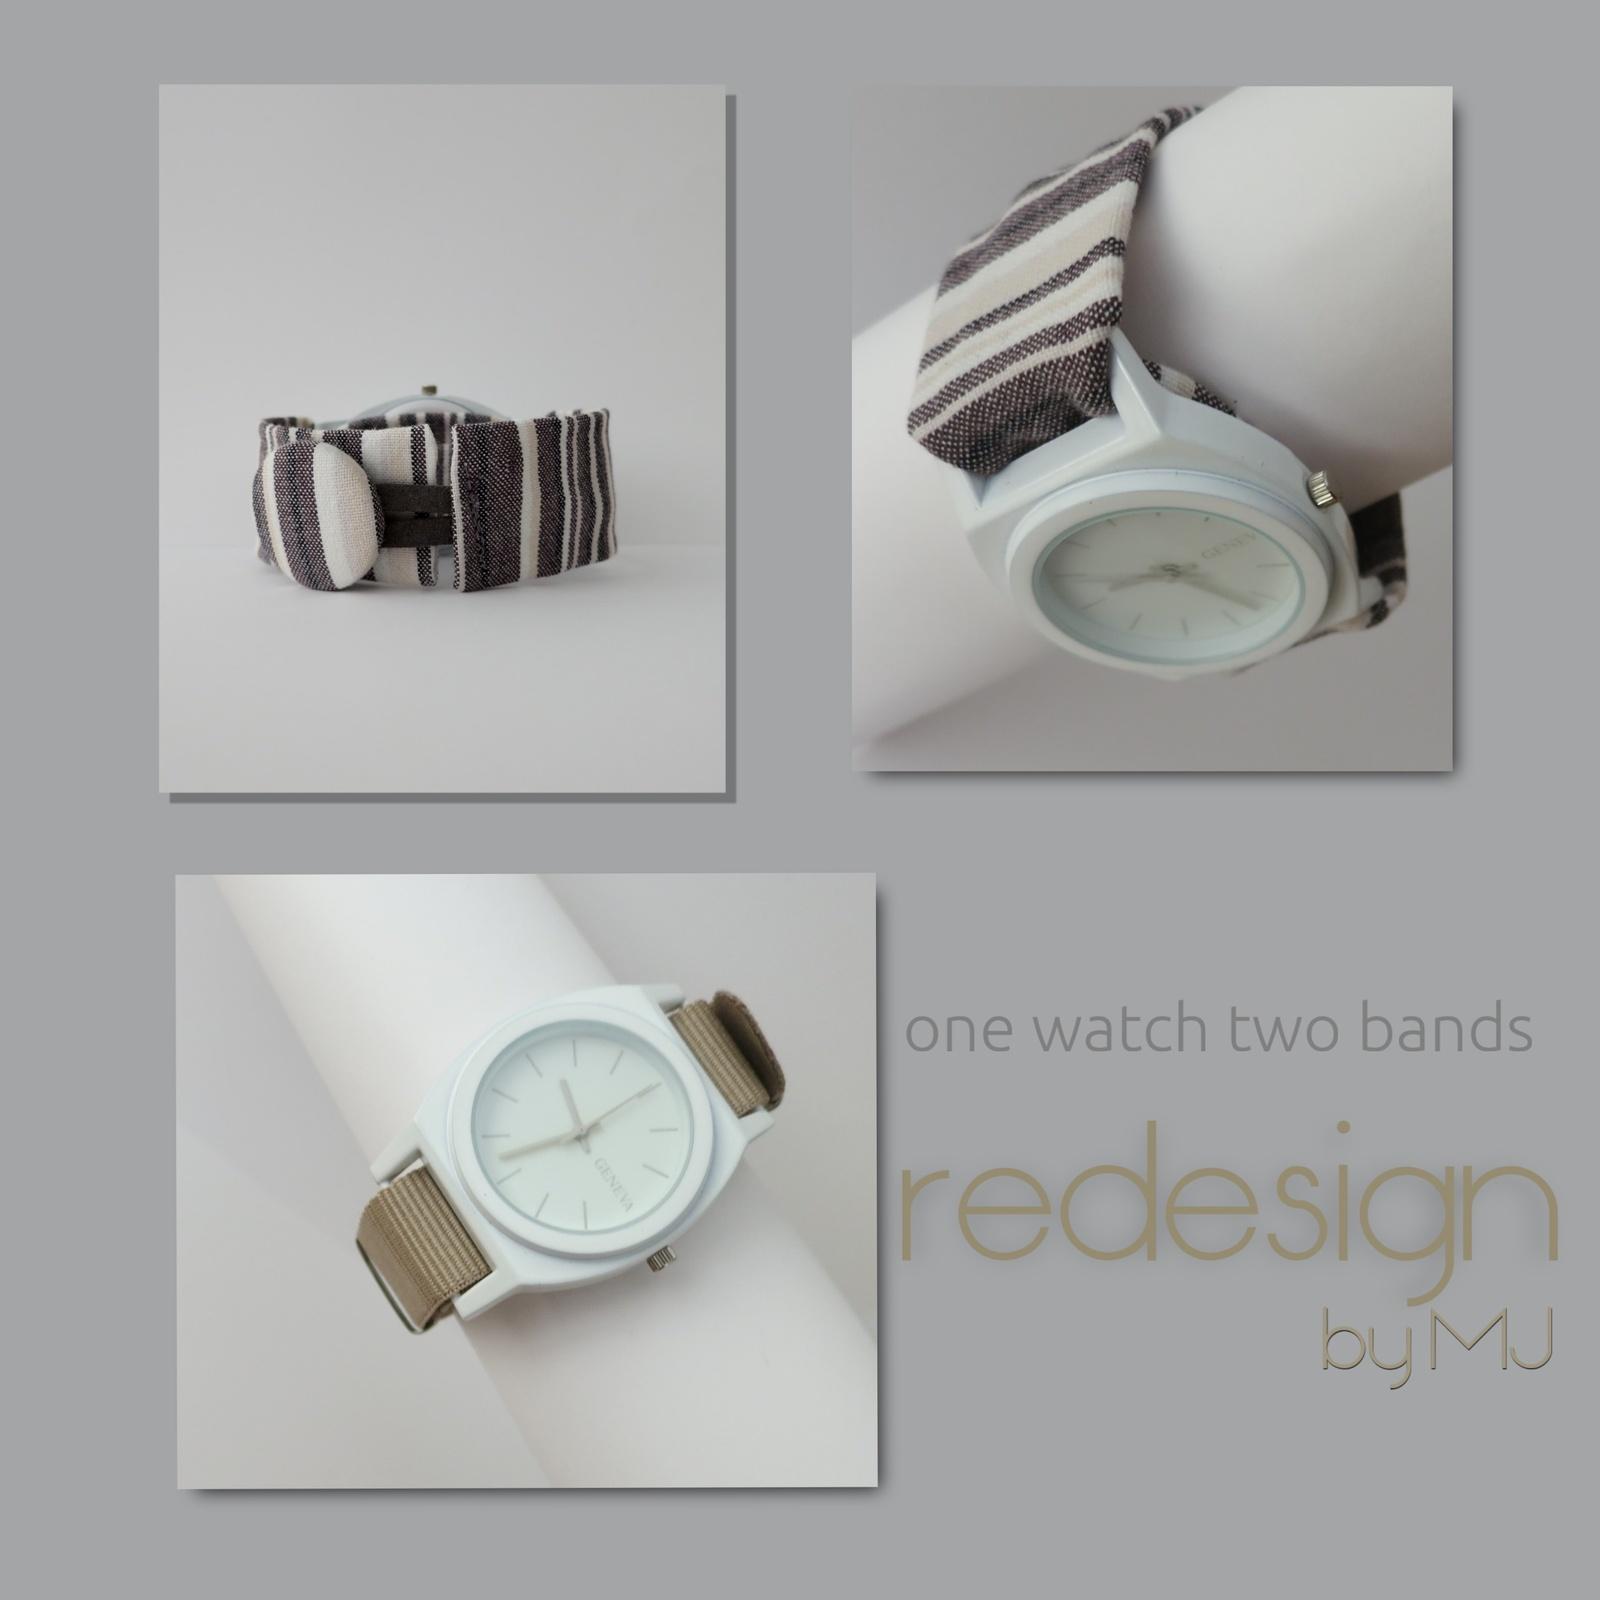 Redesign4